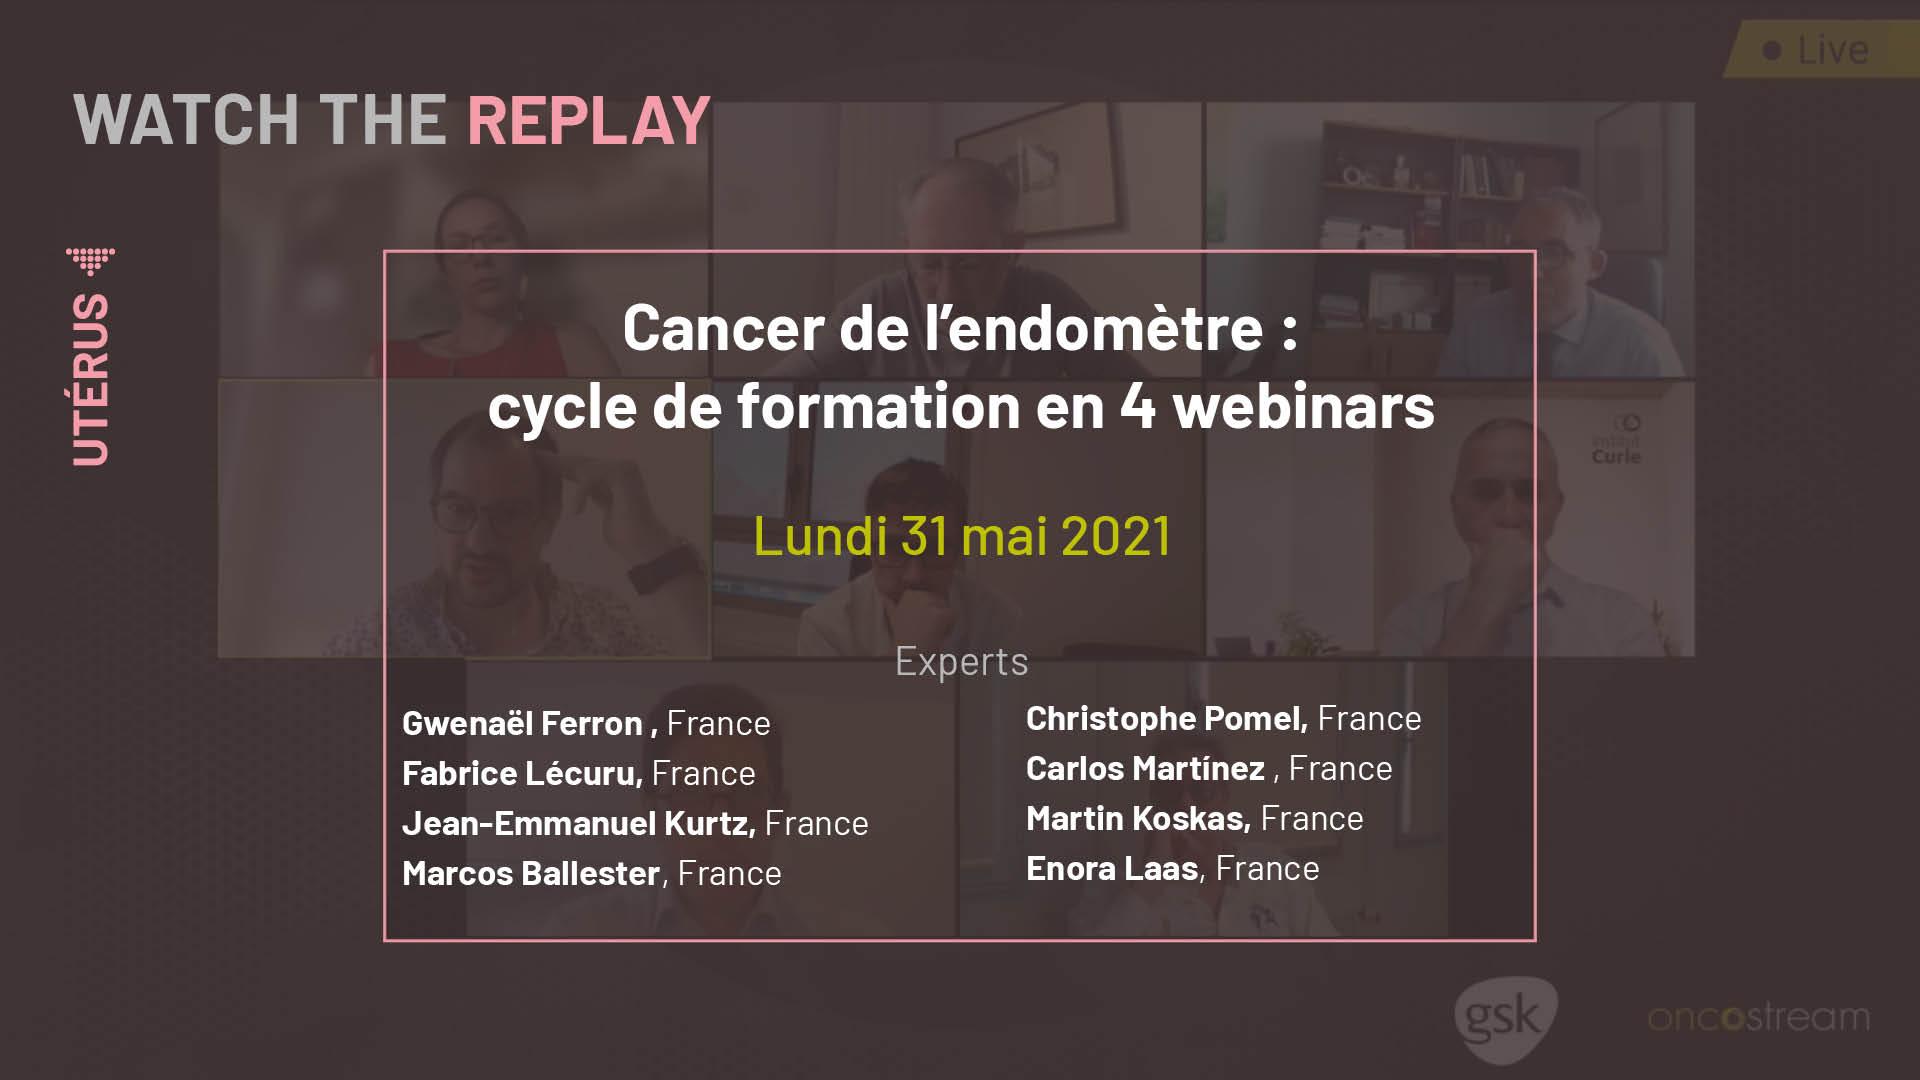 Cancer de l'endomètre : cycle de formation en 4 webinars